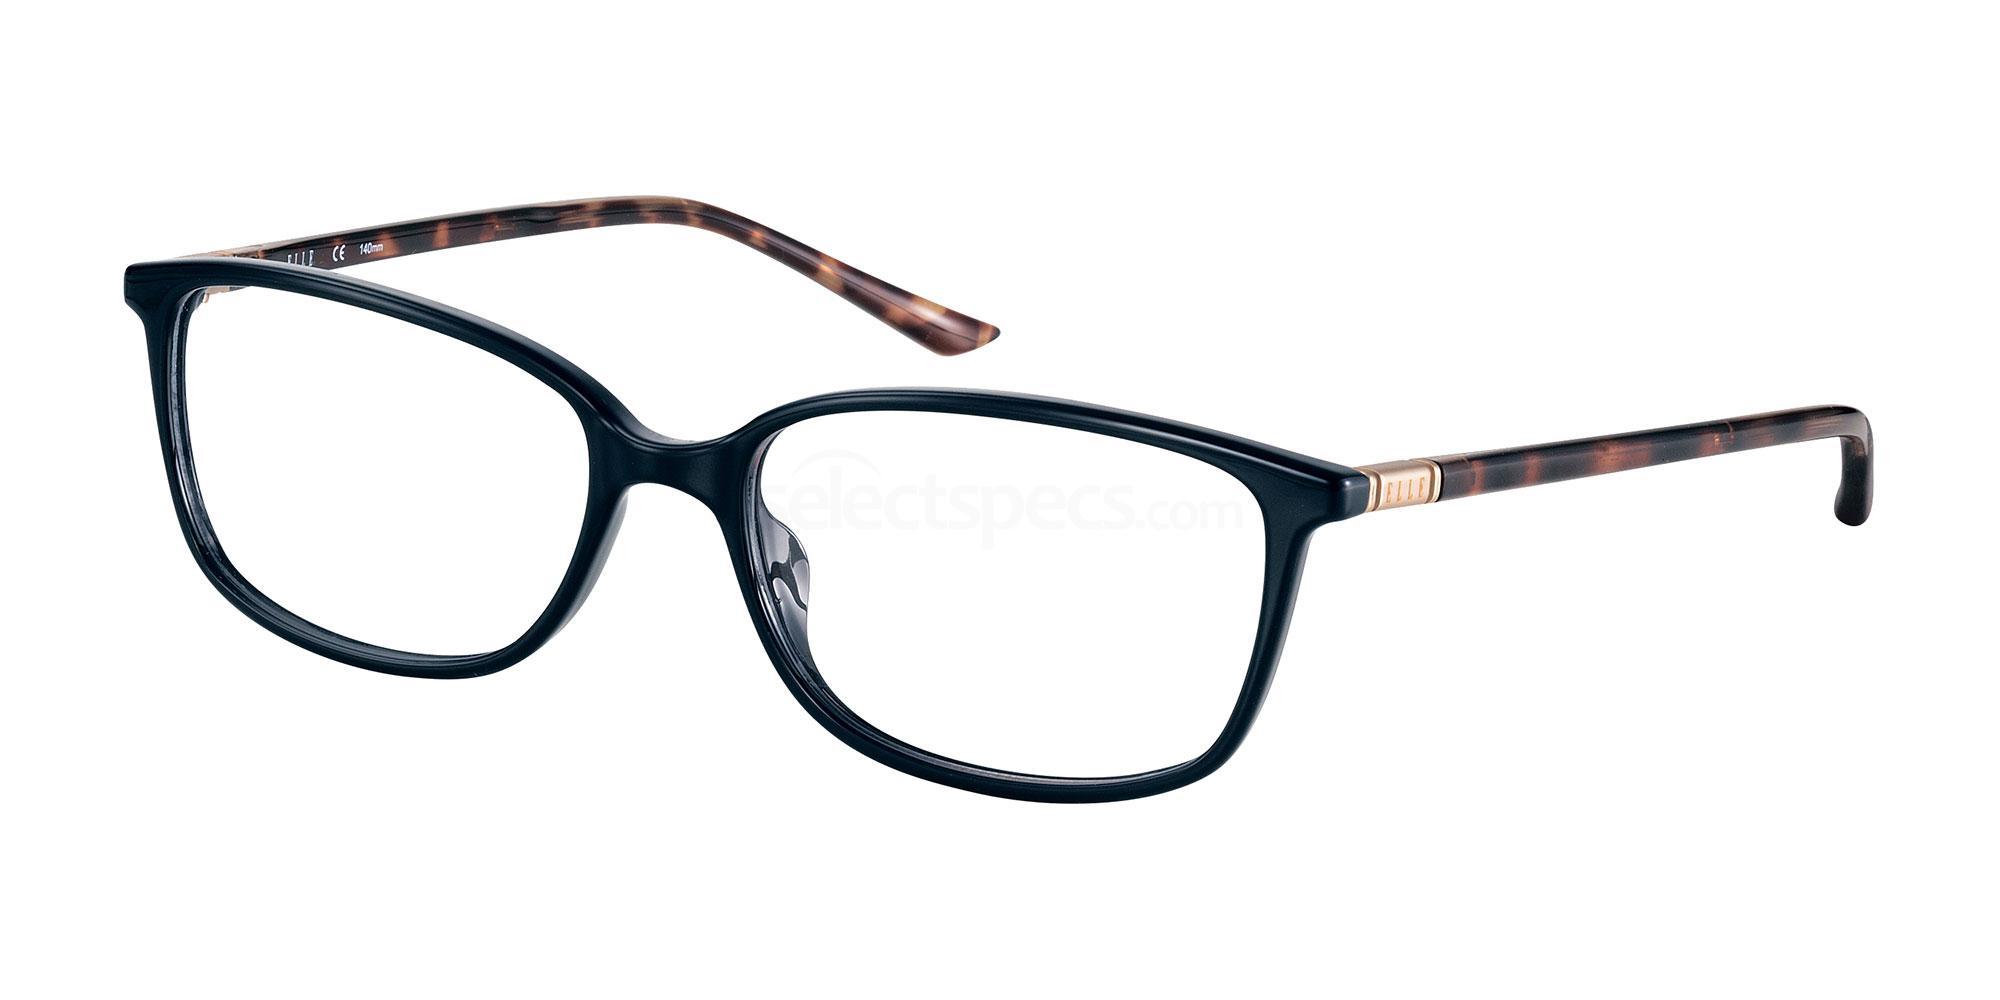 BK EL13486 Glasses, ELLE